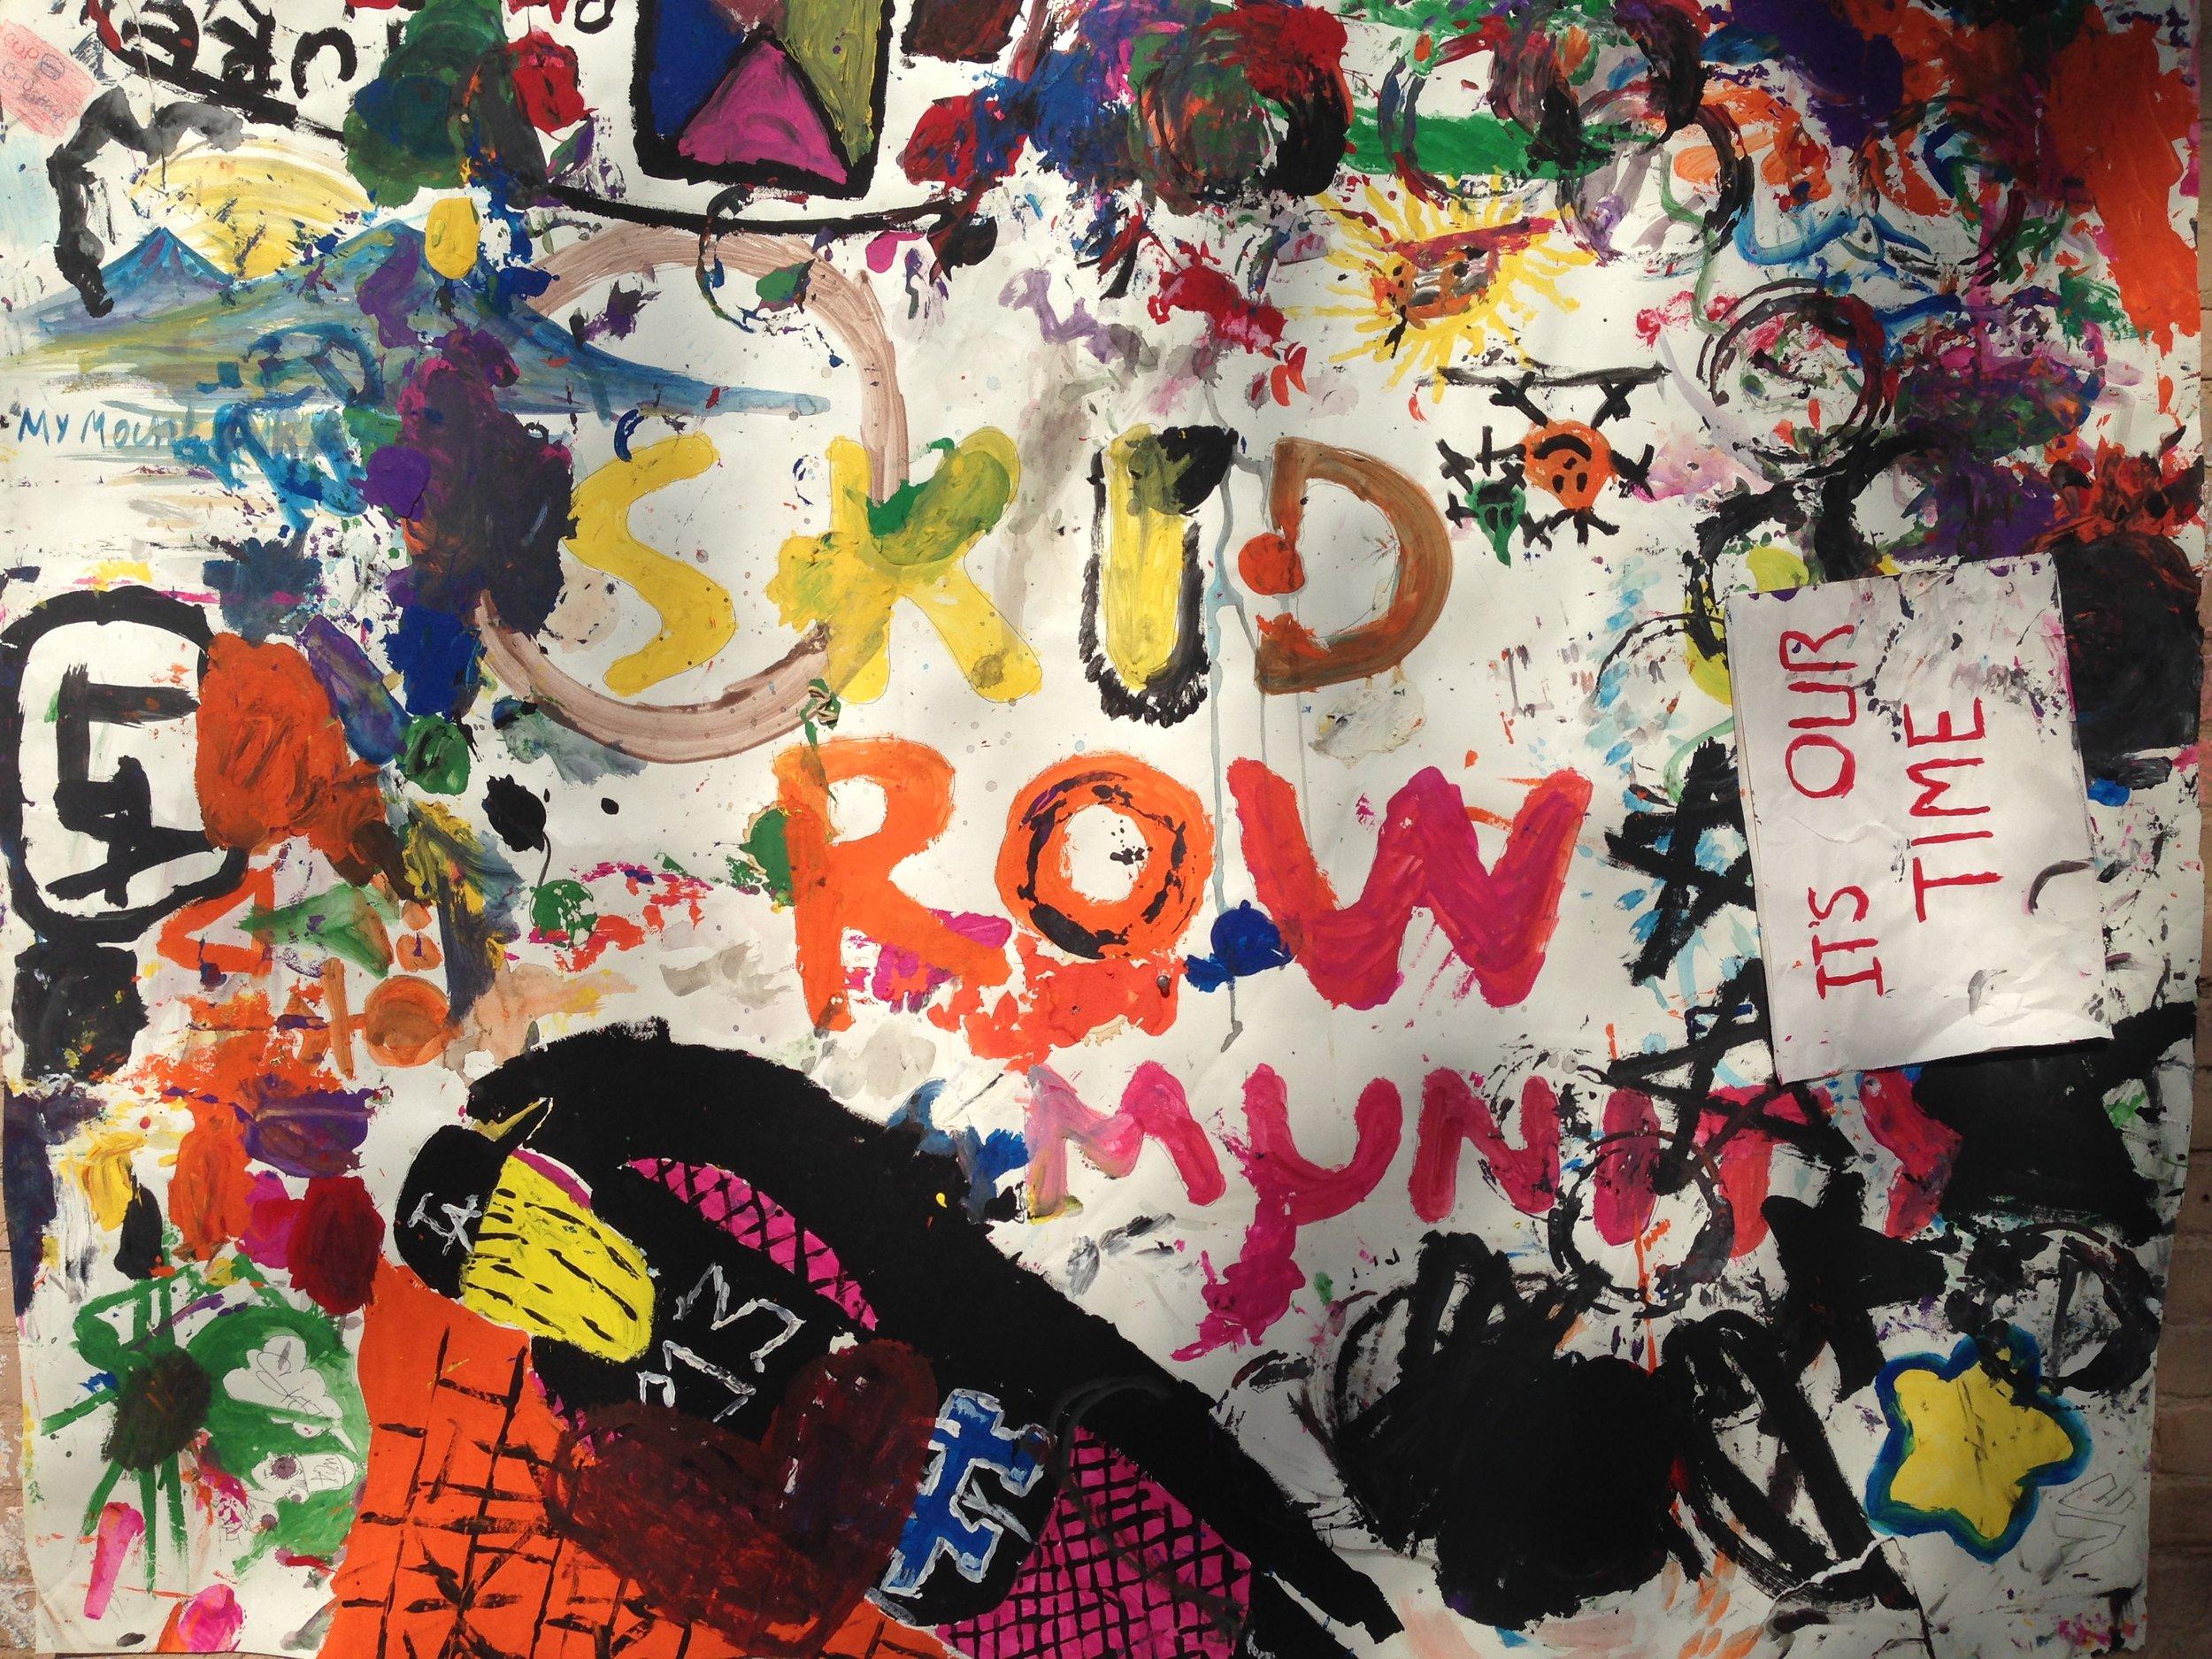 Skid Row Community Art Mural.